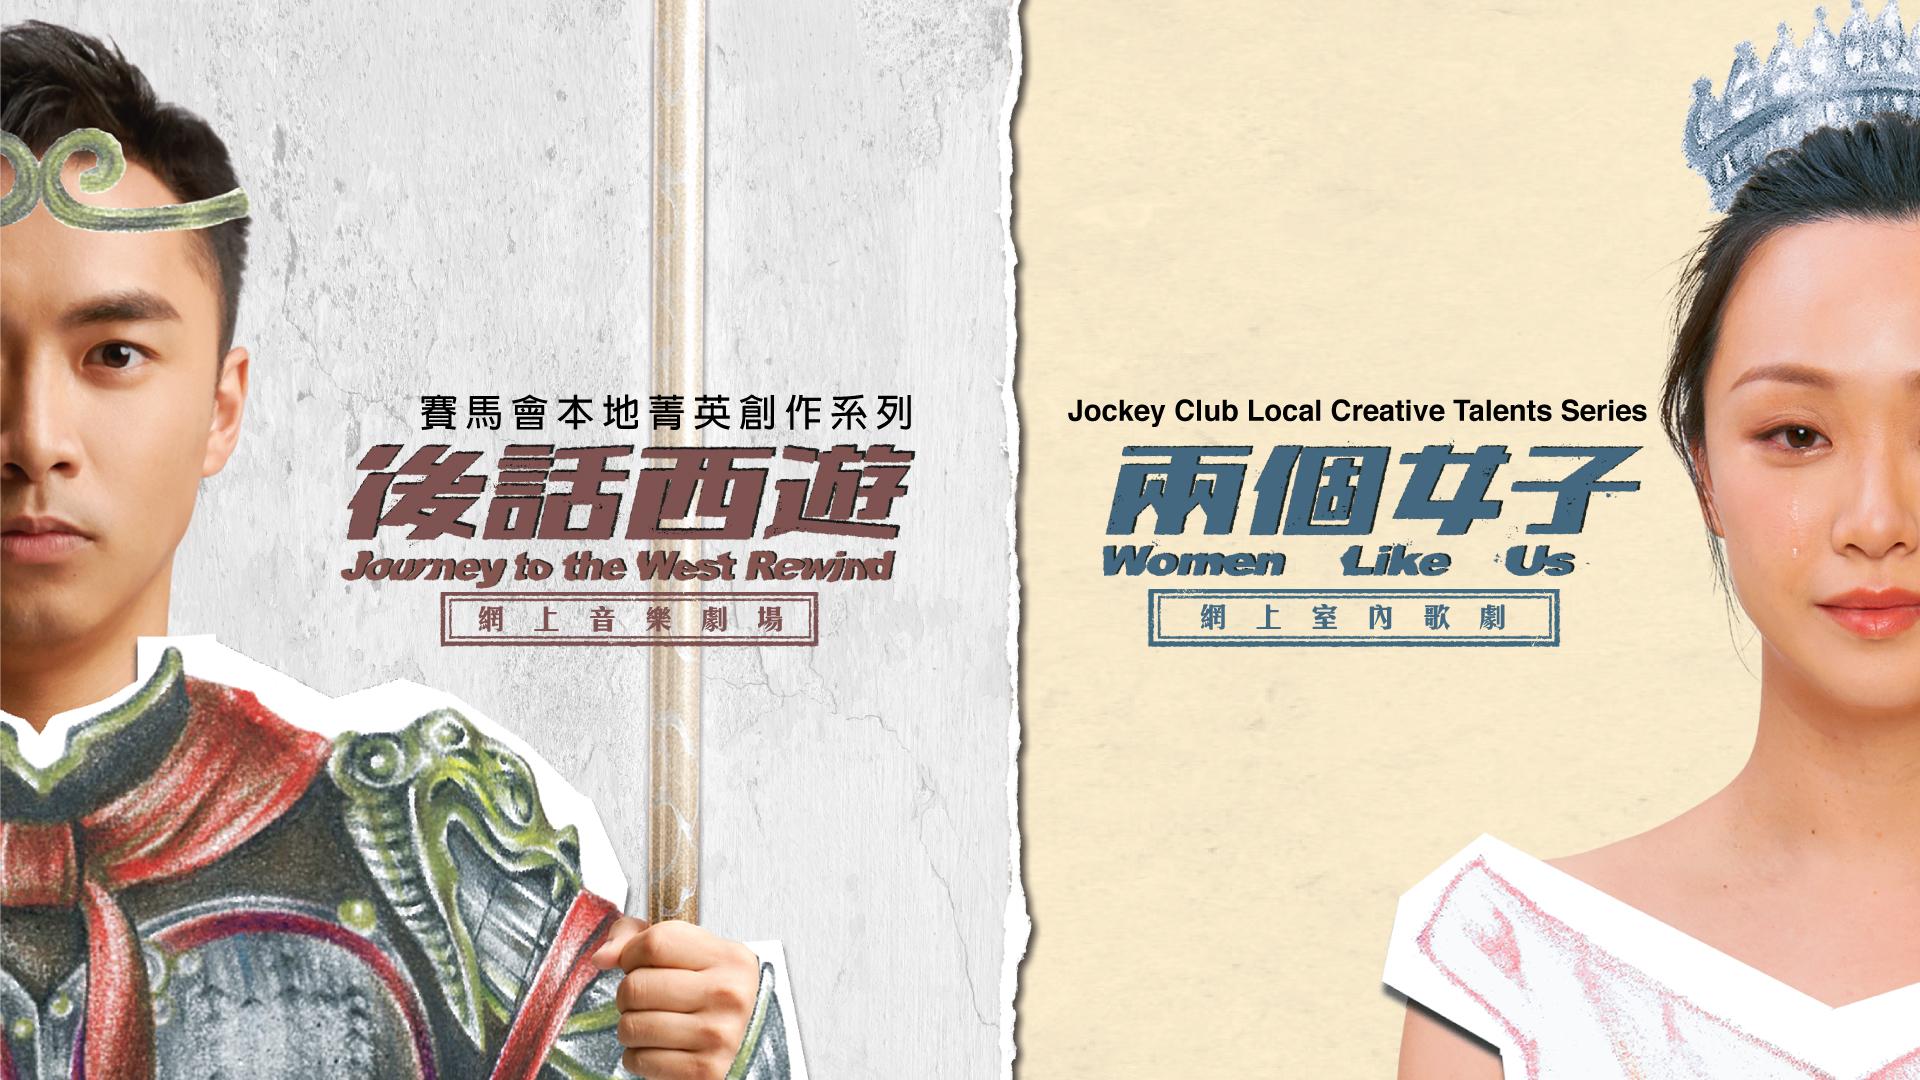 Jockey Club Local Creative Talents Series<br><i>Journey to the West Rewind/Women Like Us</i>